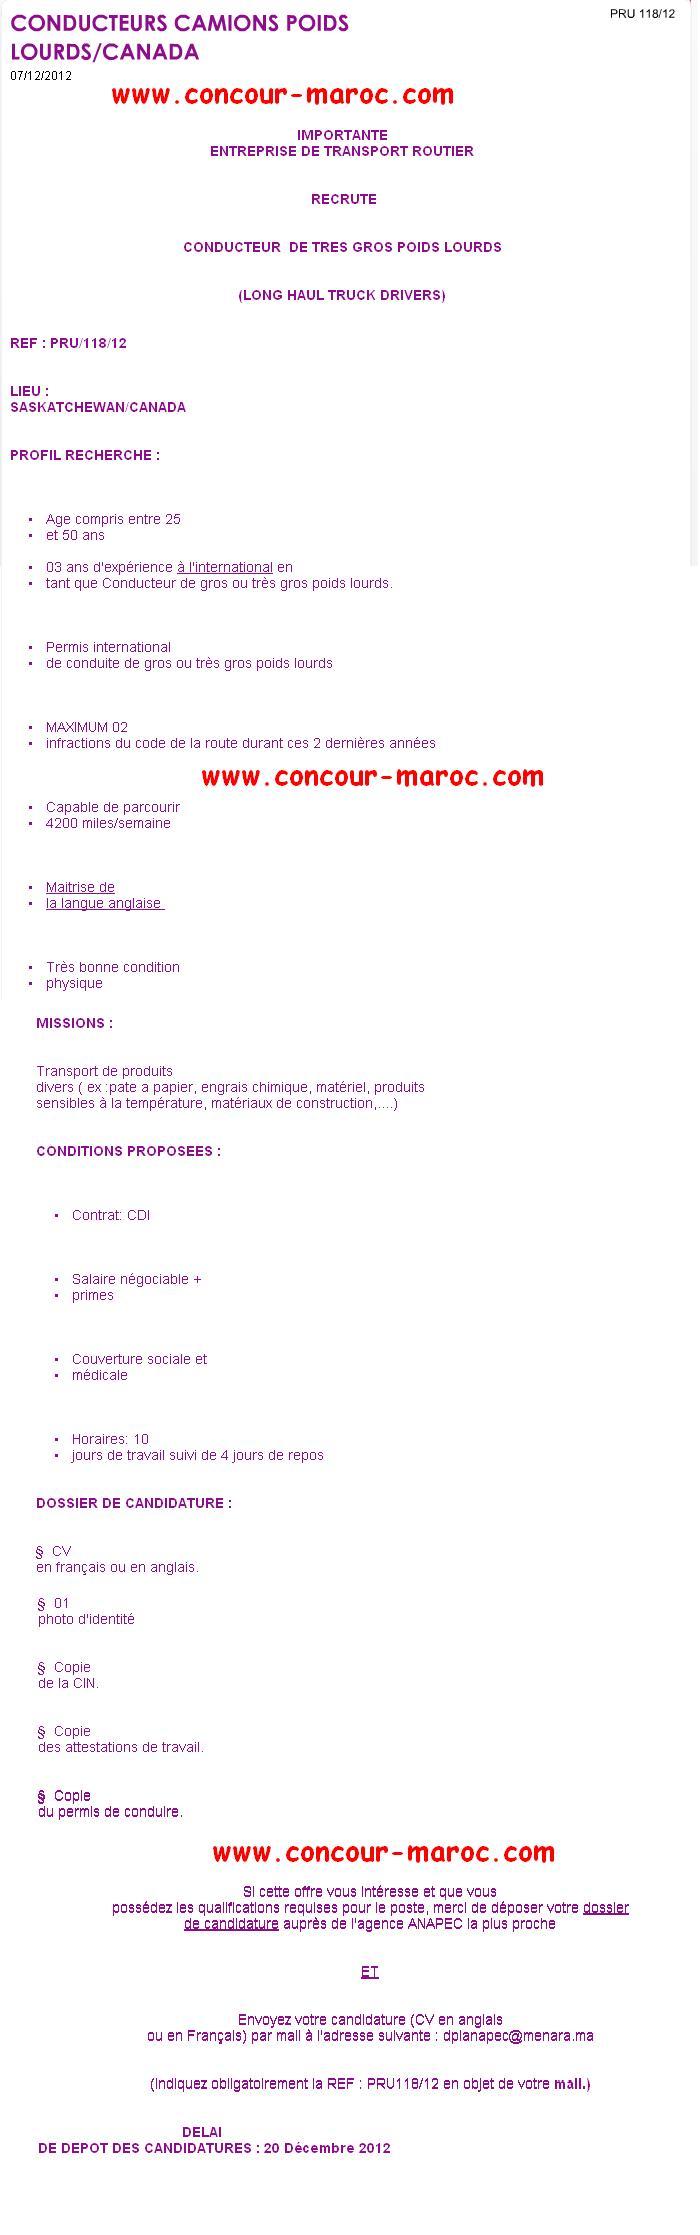 ANAPEC : شركة كندية لنقل الطرقي توظيف سائقي الوزن الثقيل من المغرب قبل 20 دجنبر 2012 Emploi13